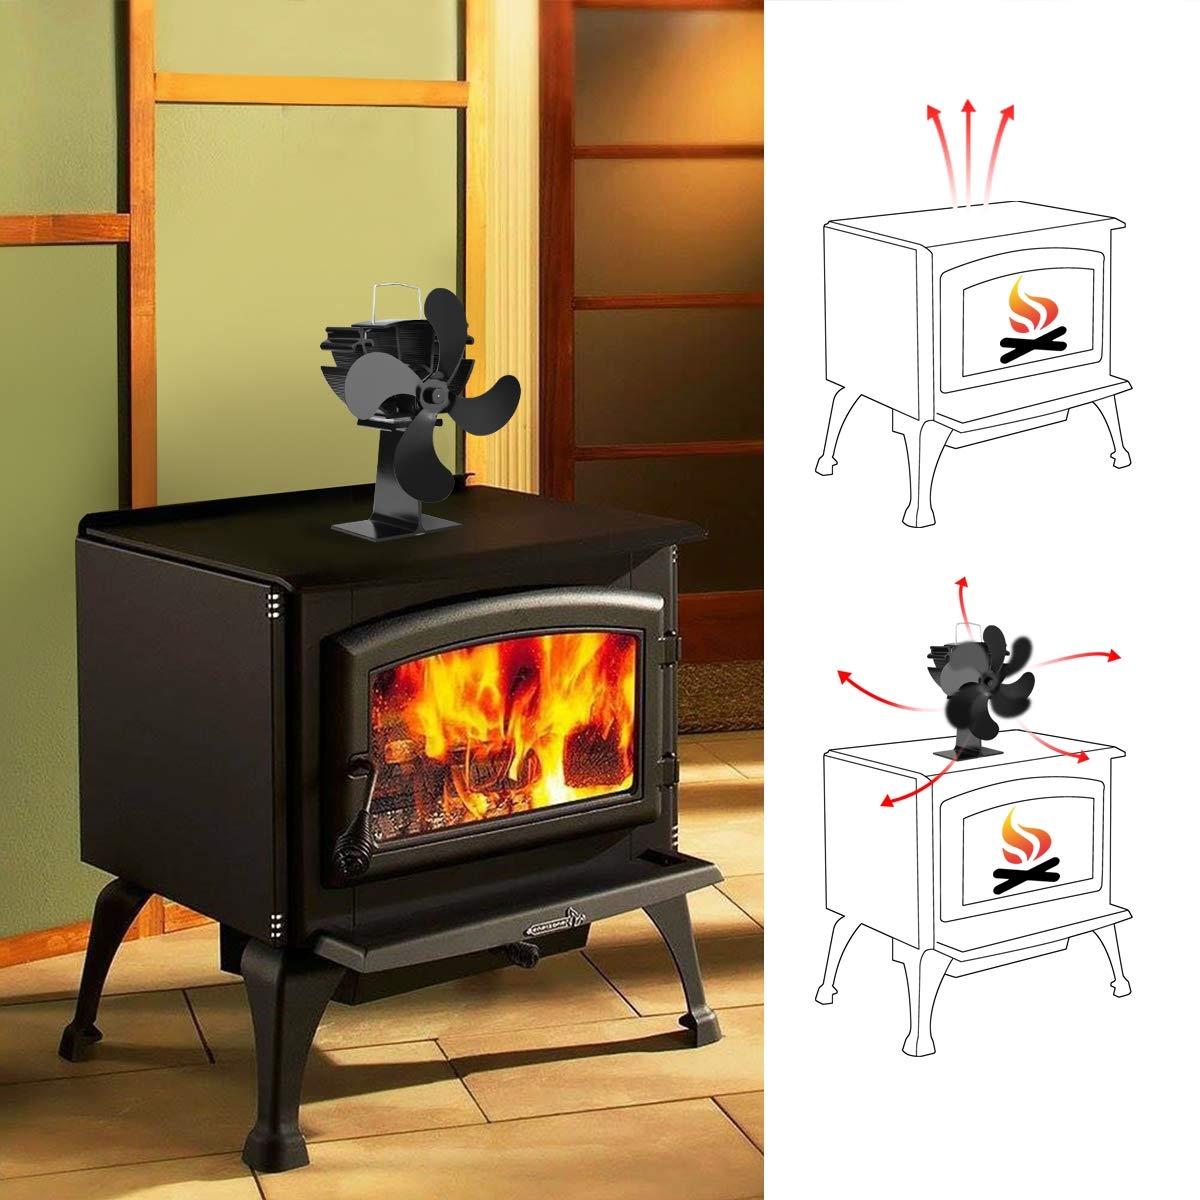 AMZ BCS Ventilador de Estufa accionado por Calor de 4 Cuchillas ...